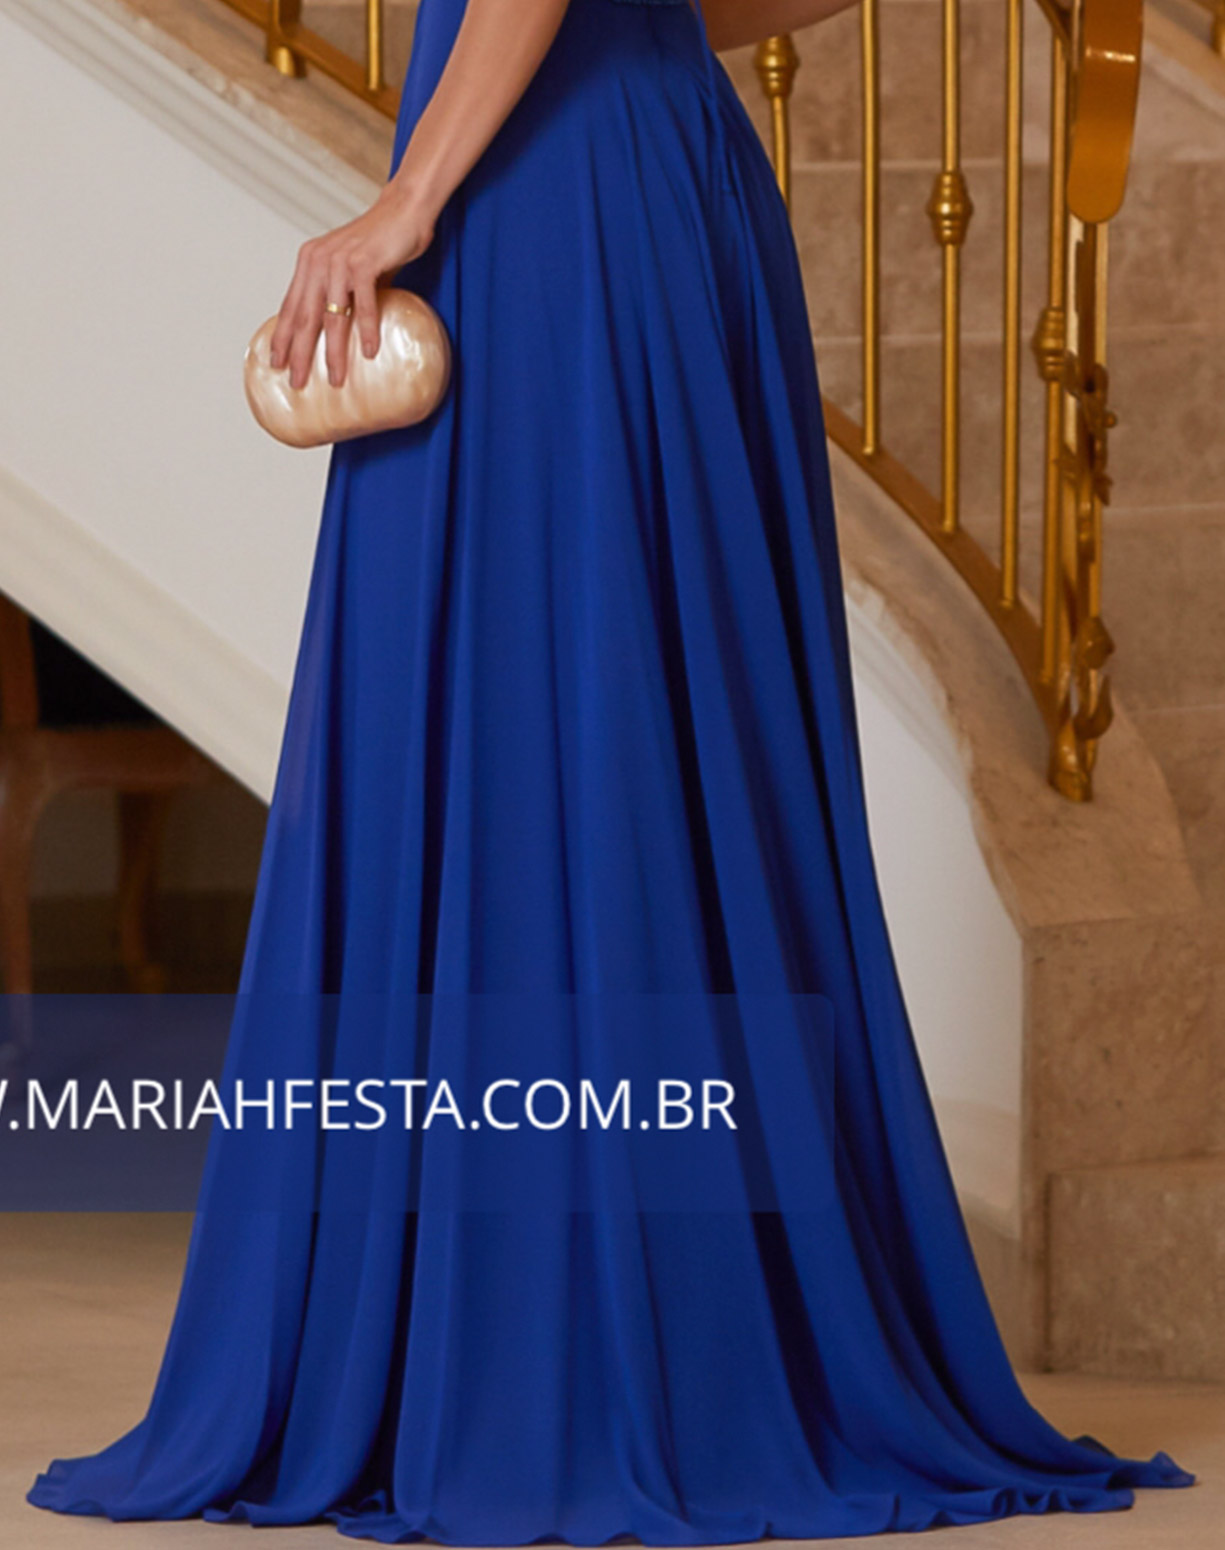 Vestido Azul Royal com Corpo Bordado